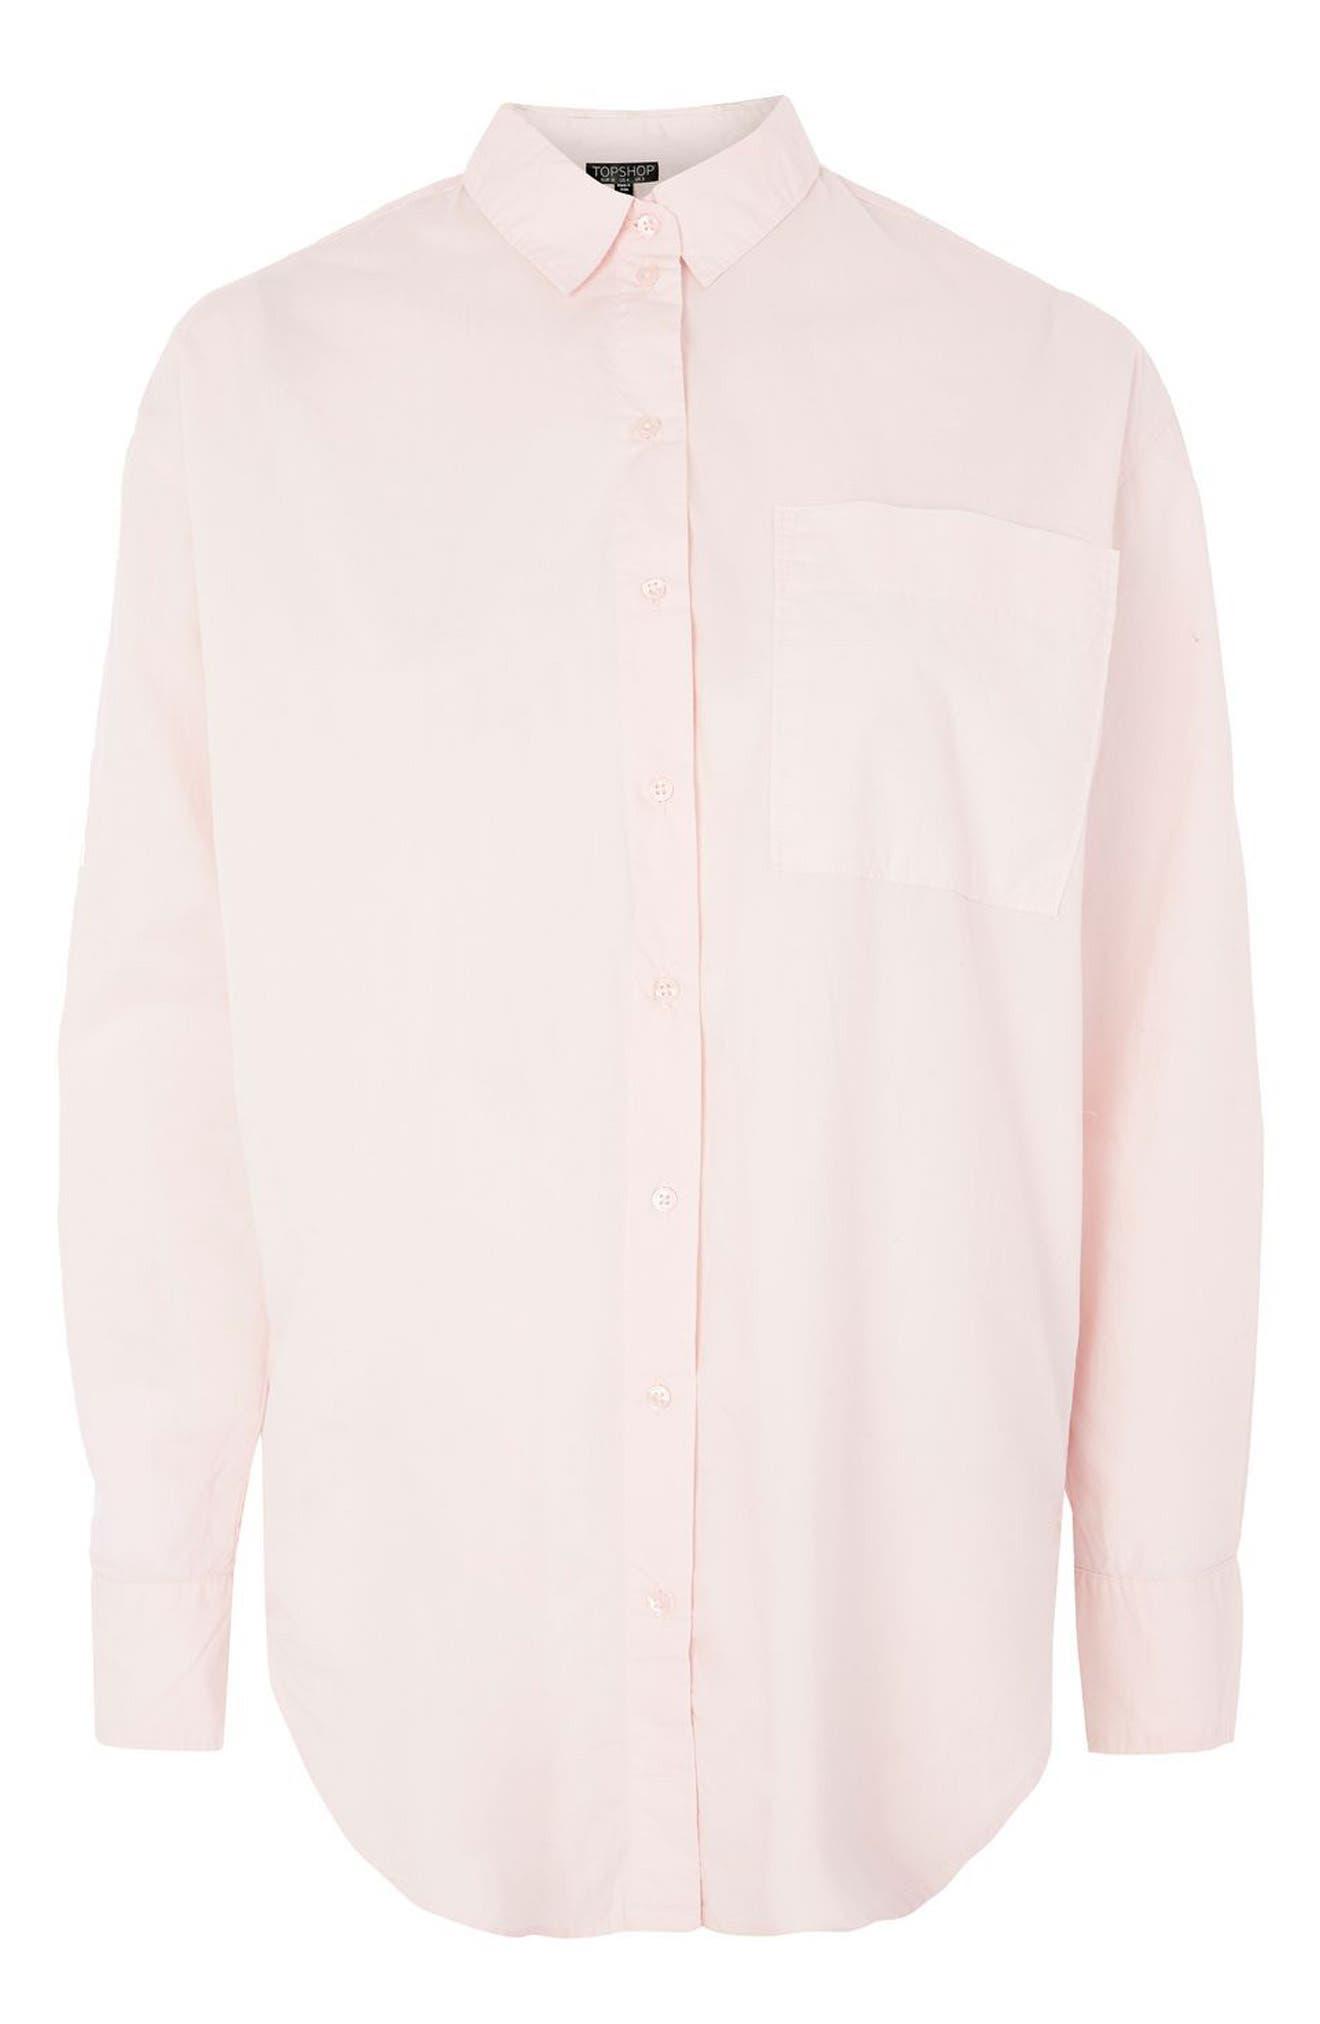 Olly Oversize Poplin Shirt,                             Alternate thumbnail 3, color,                             Light Pink